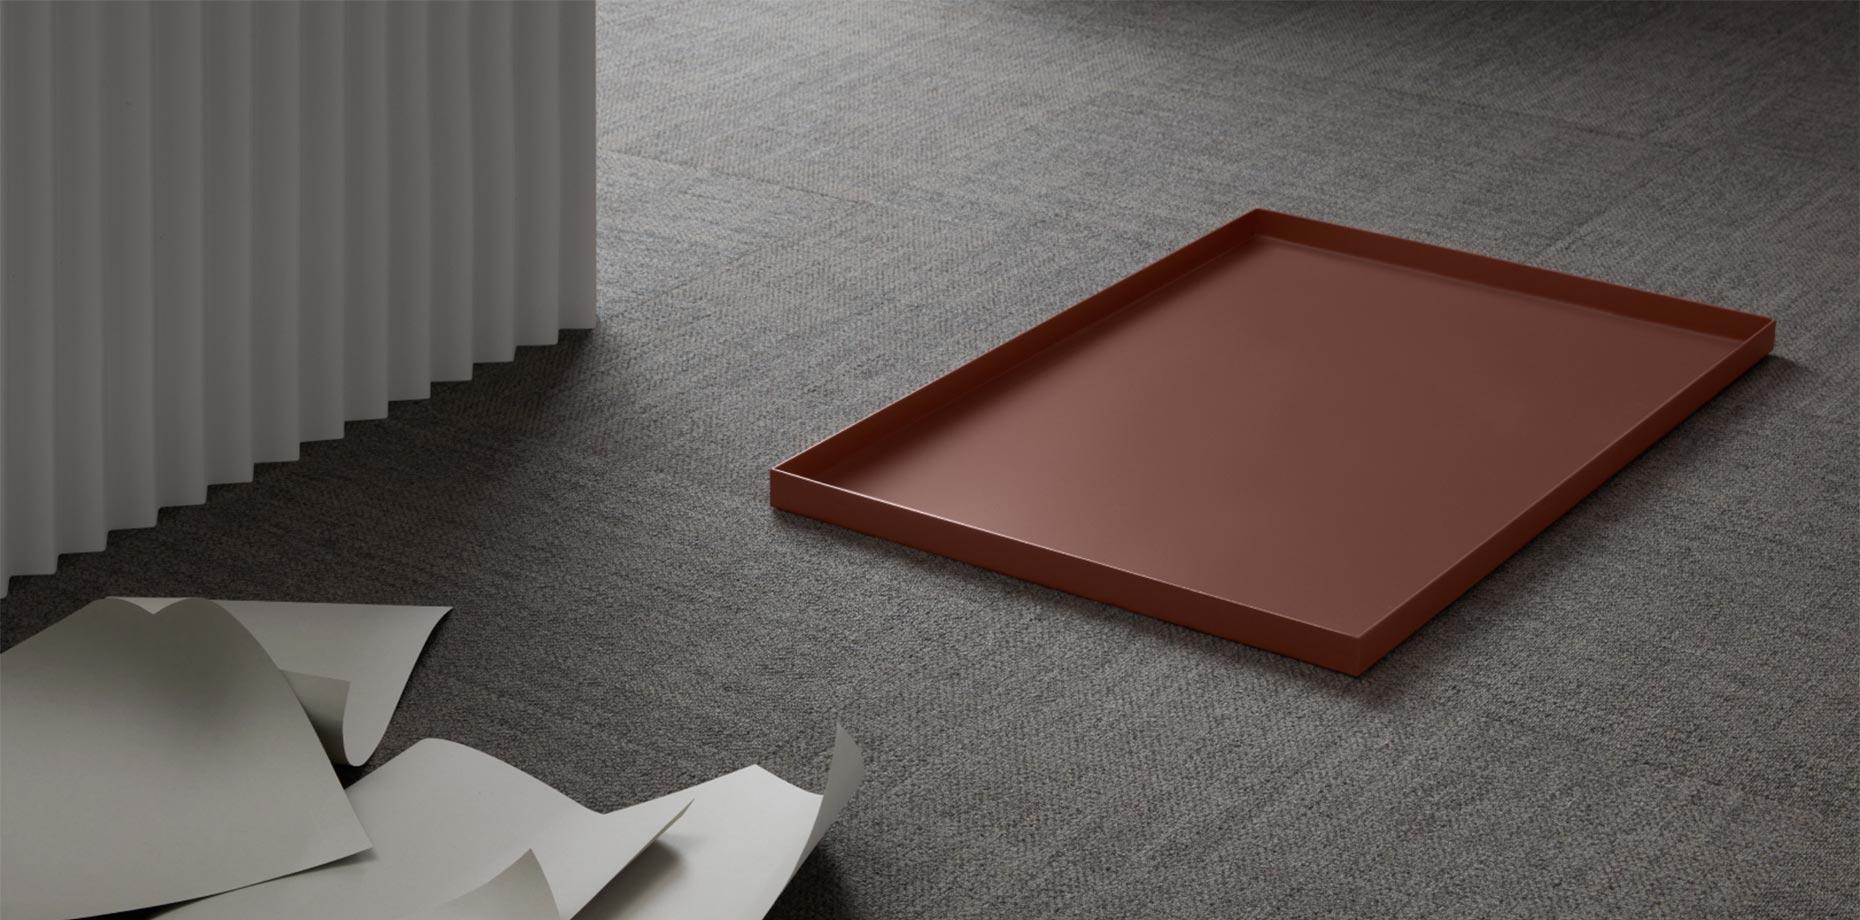 The Carpet Tile